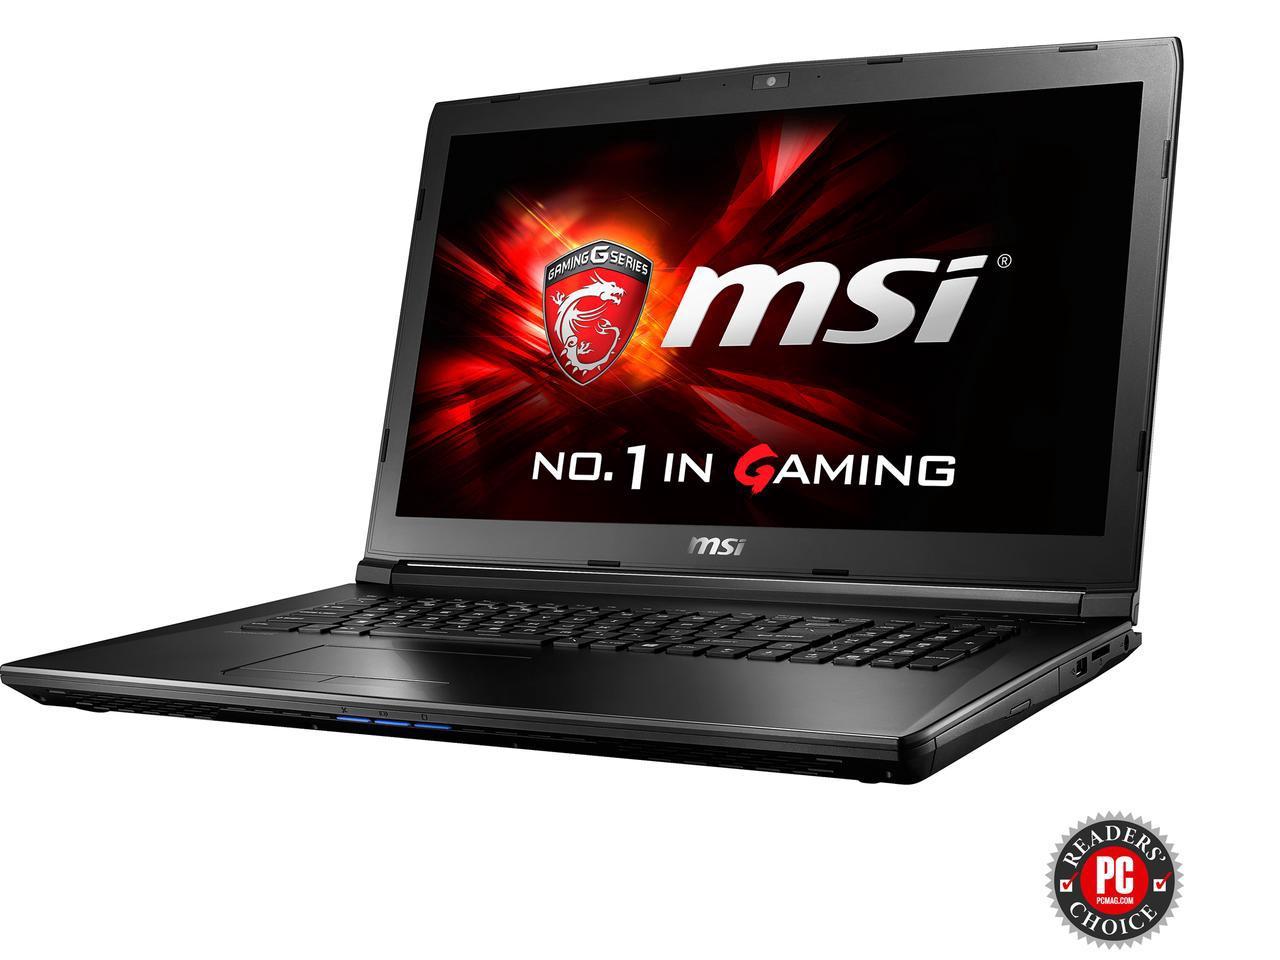 "MSI GL72 7QF-1057 17.3"" Intel Core i7 7th Gen 7700HQ (2.80 GHz) NVIDIA GeForce GTX 960M 8 GB Memory 1 TB HDD Windows 10 Home 64-Bit Gaming Laptop $699AR"